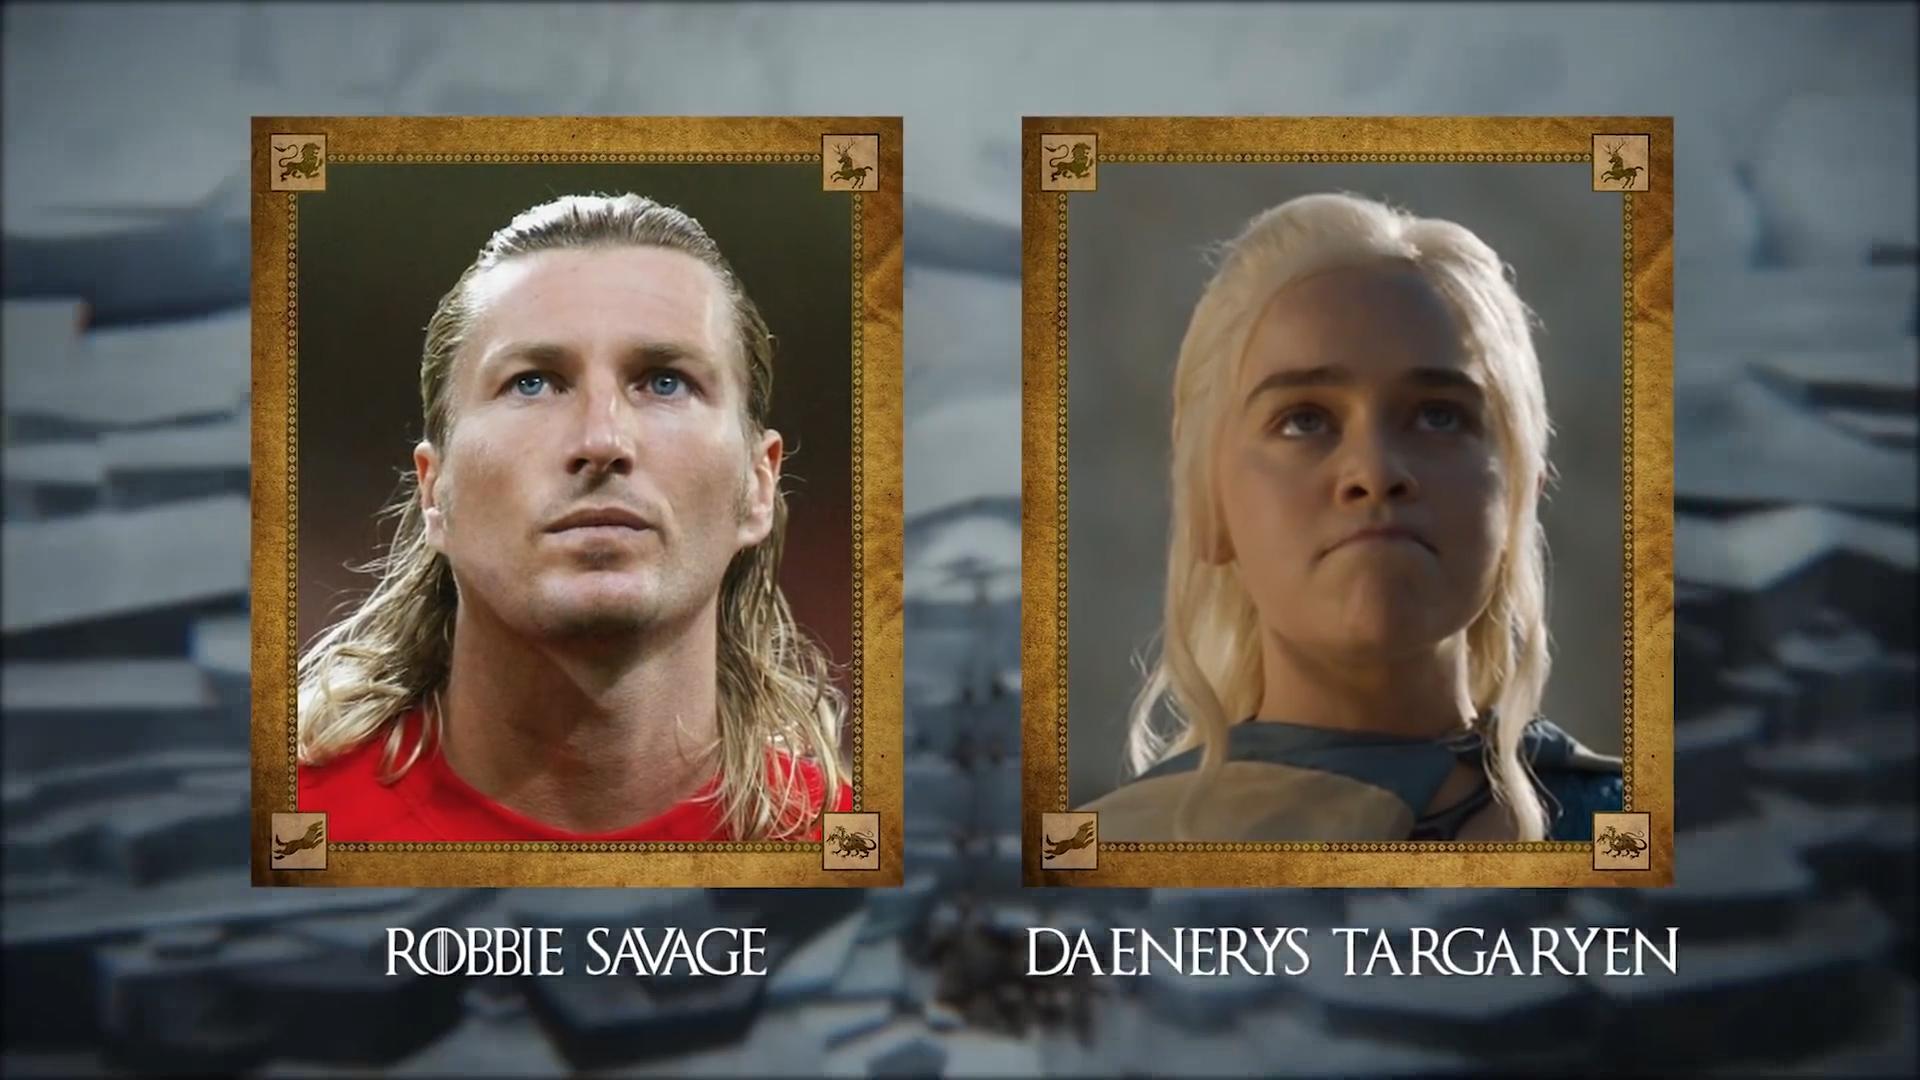 Robbie Savage (ex futbolista inglés) con Daenerys Targaryen